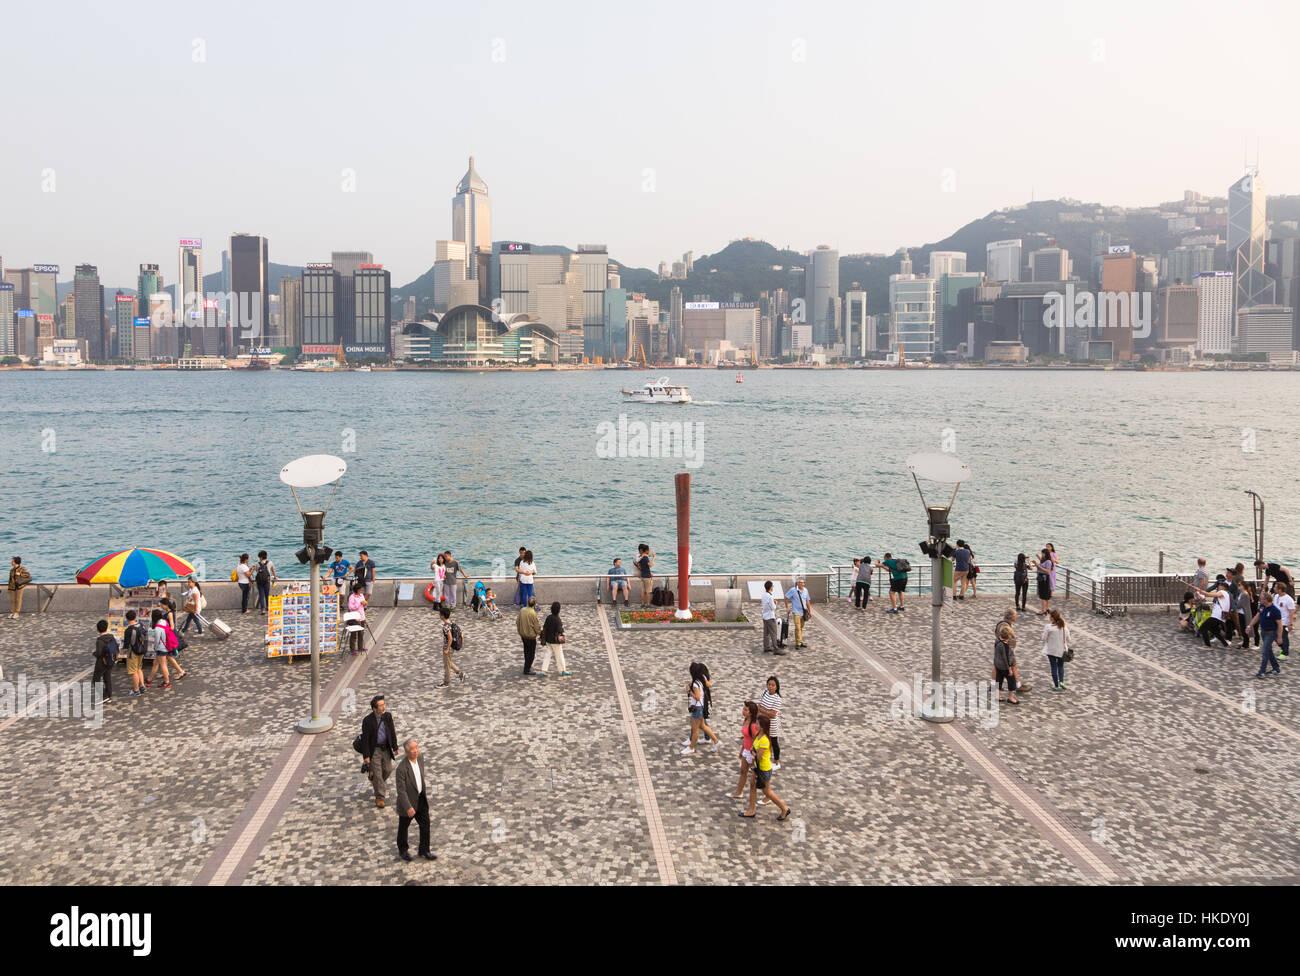 Hong Kong, Hong Kong - 26 Aprile 2015: turisti scattare foto e gustare la famosa isola di Hong Kong skyline su Victoria Immagini Stock